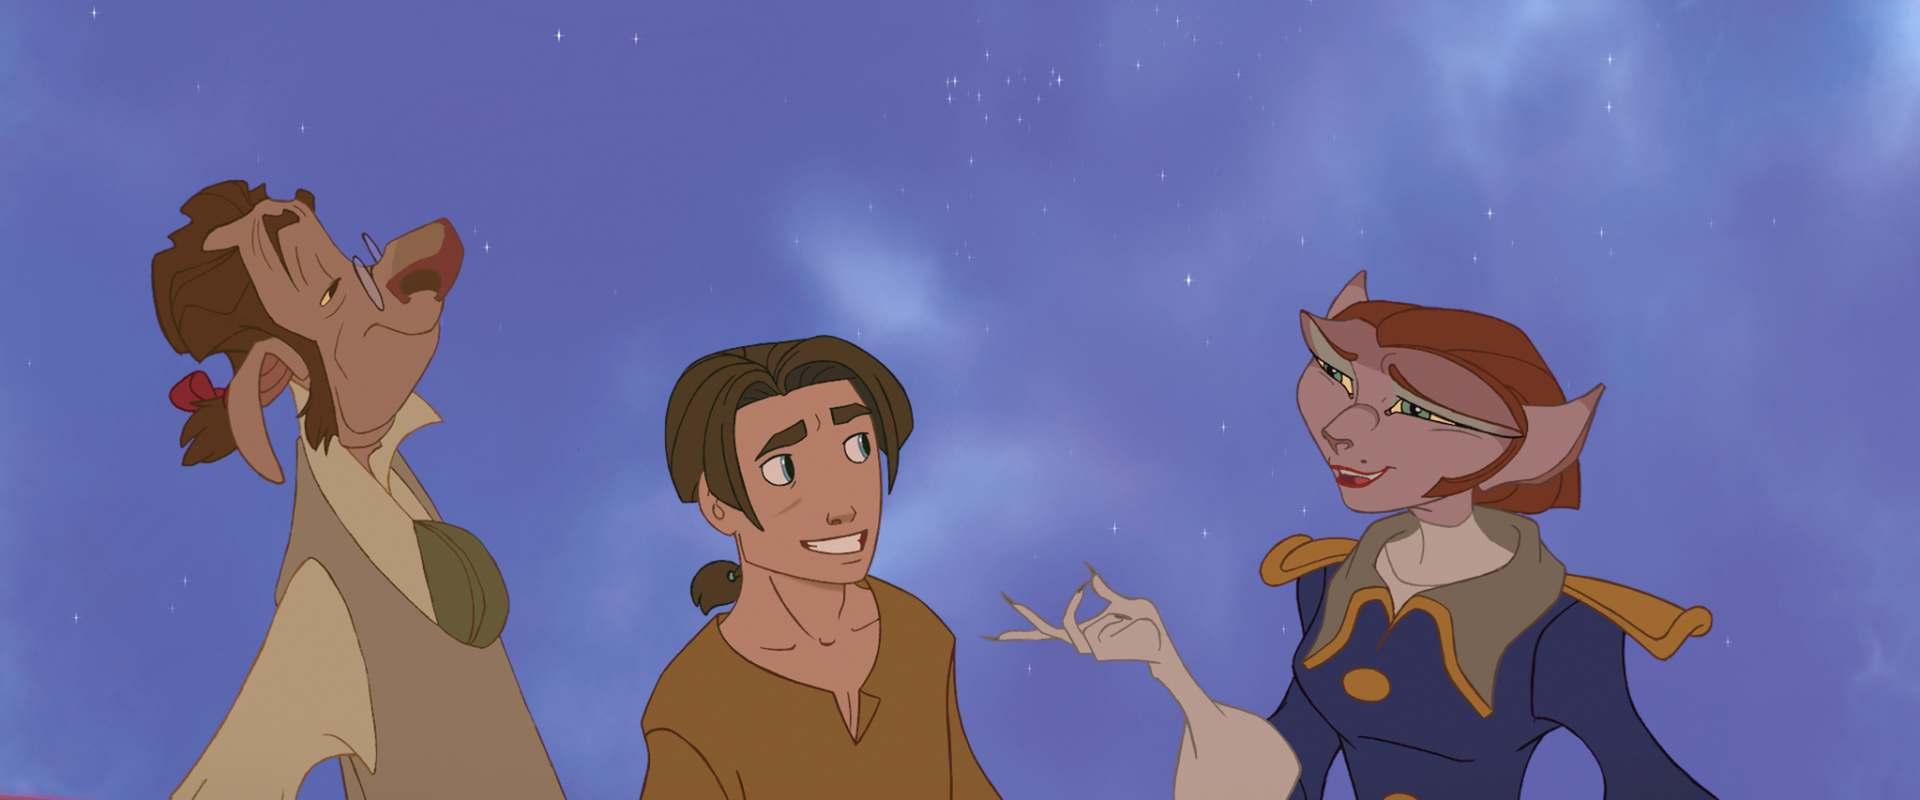 Treasure Planet | Disney | Sequel | Beyond The Box Set